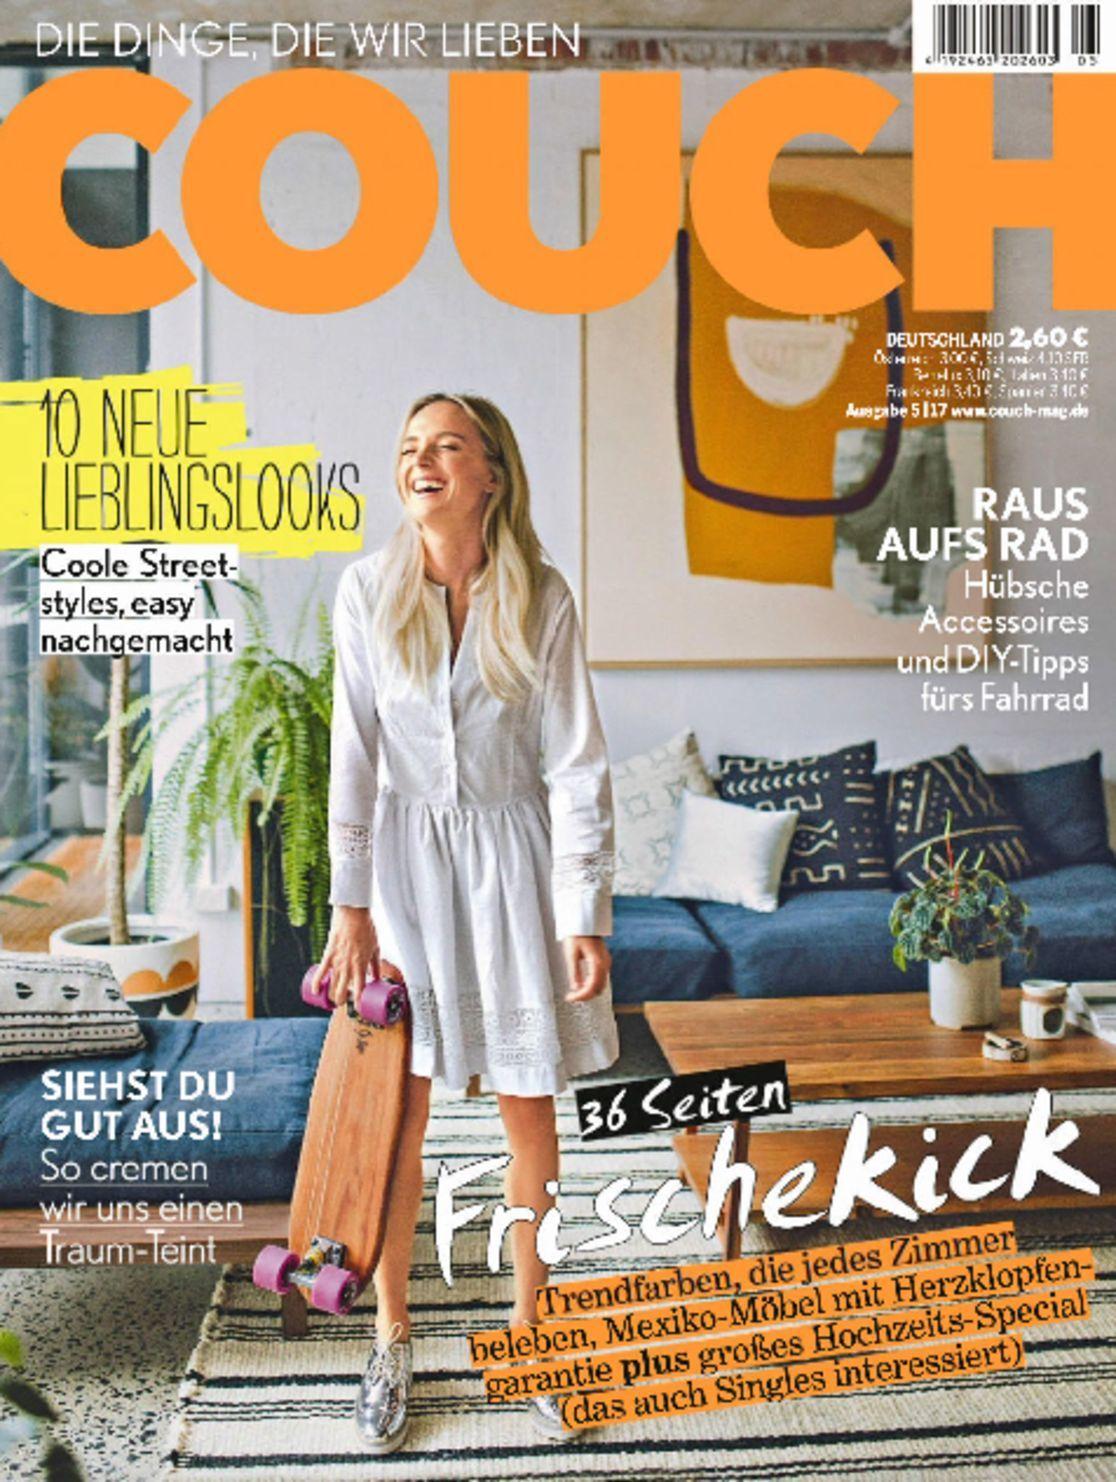 couch magazine digital. Black Bedroom Furniture Sets. Home Design Ideas